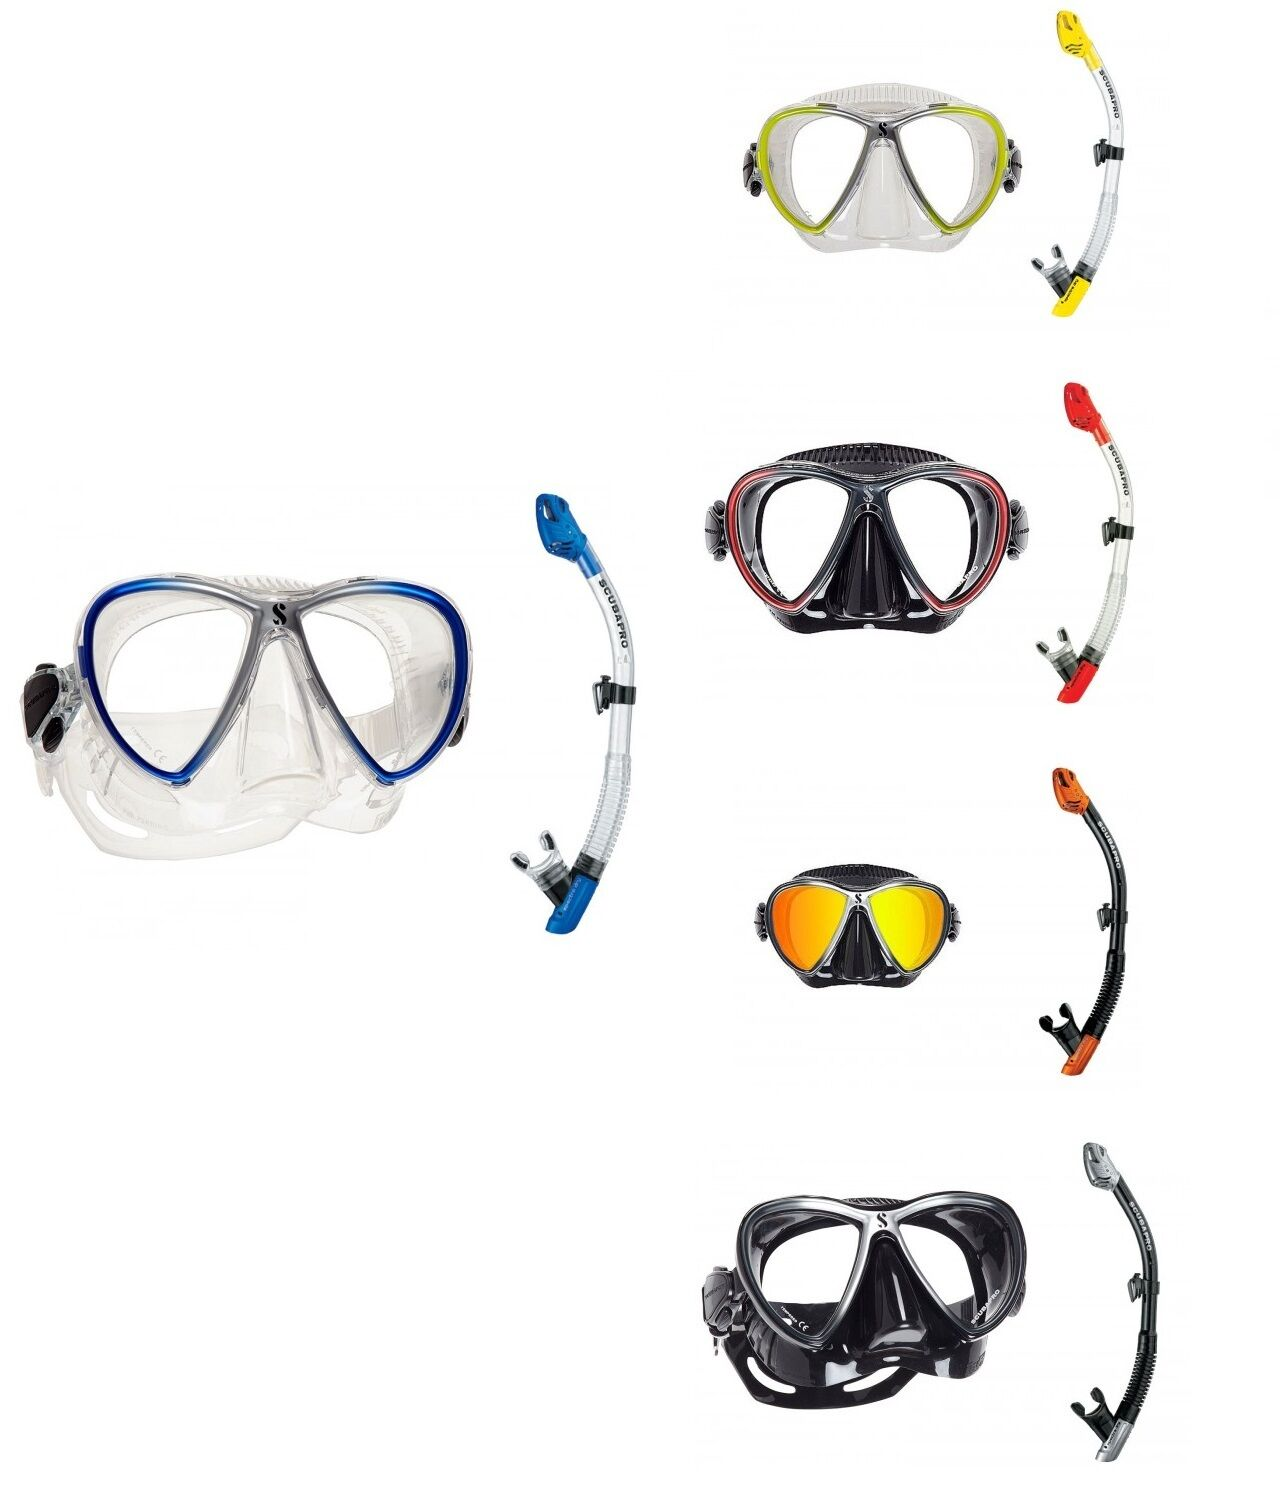 Scubapro Synergy Twin Spectra Dry Schnorchelset maskenset Various Colours